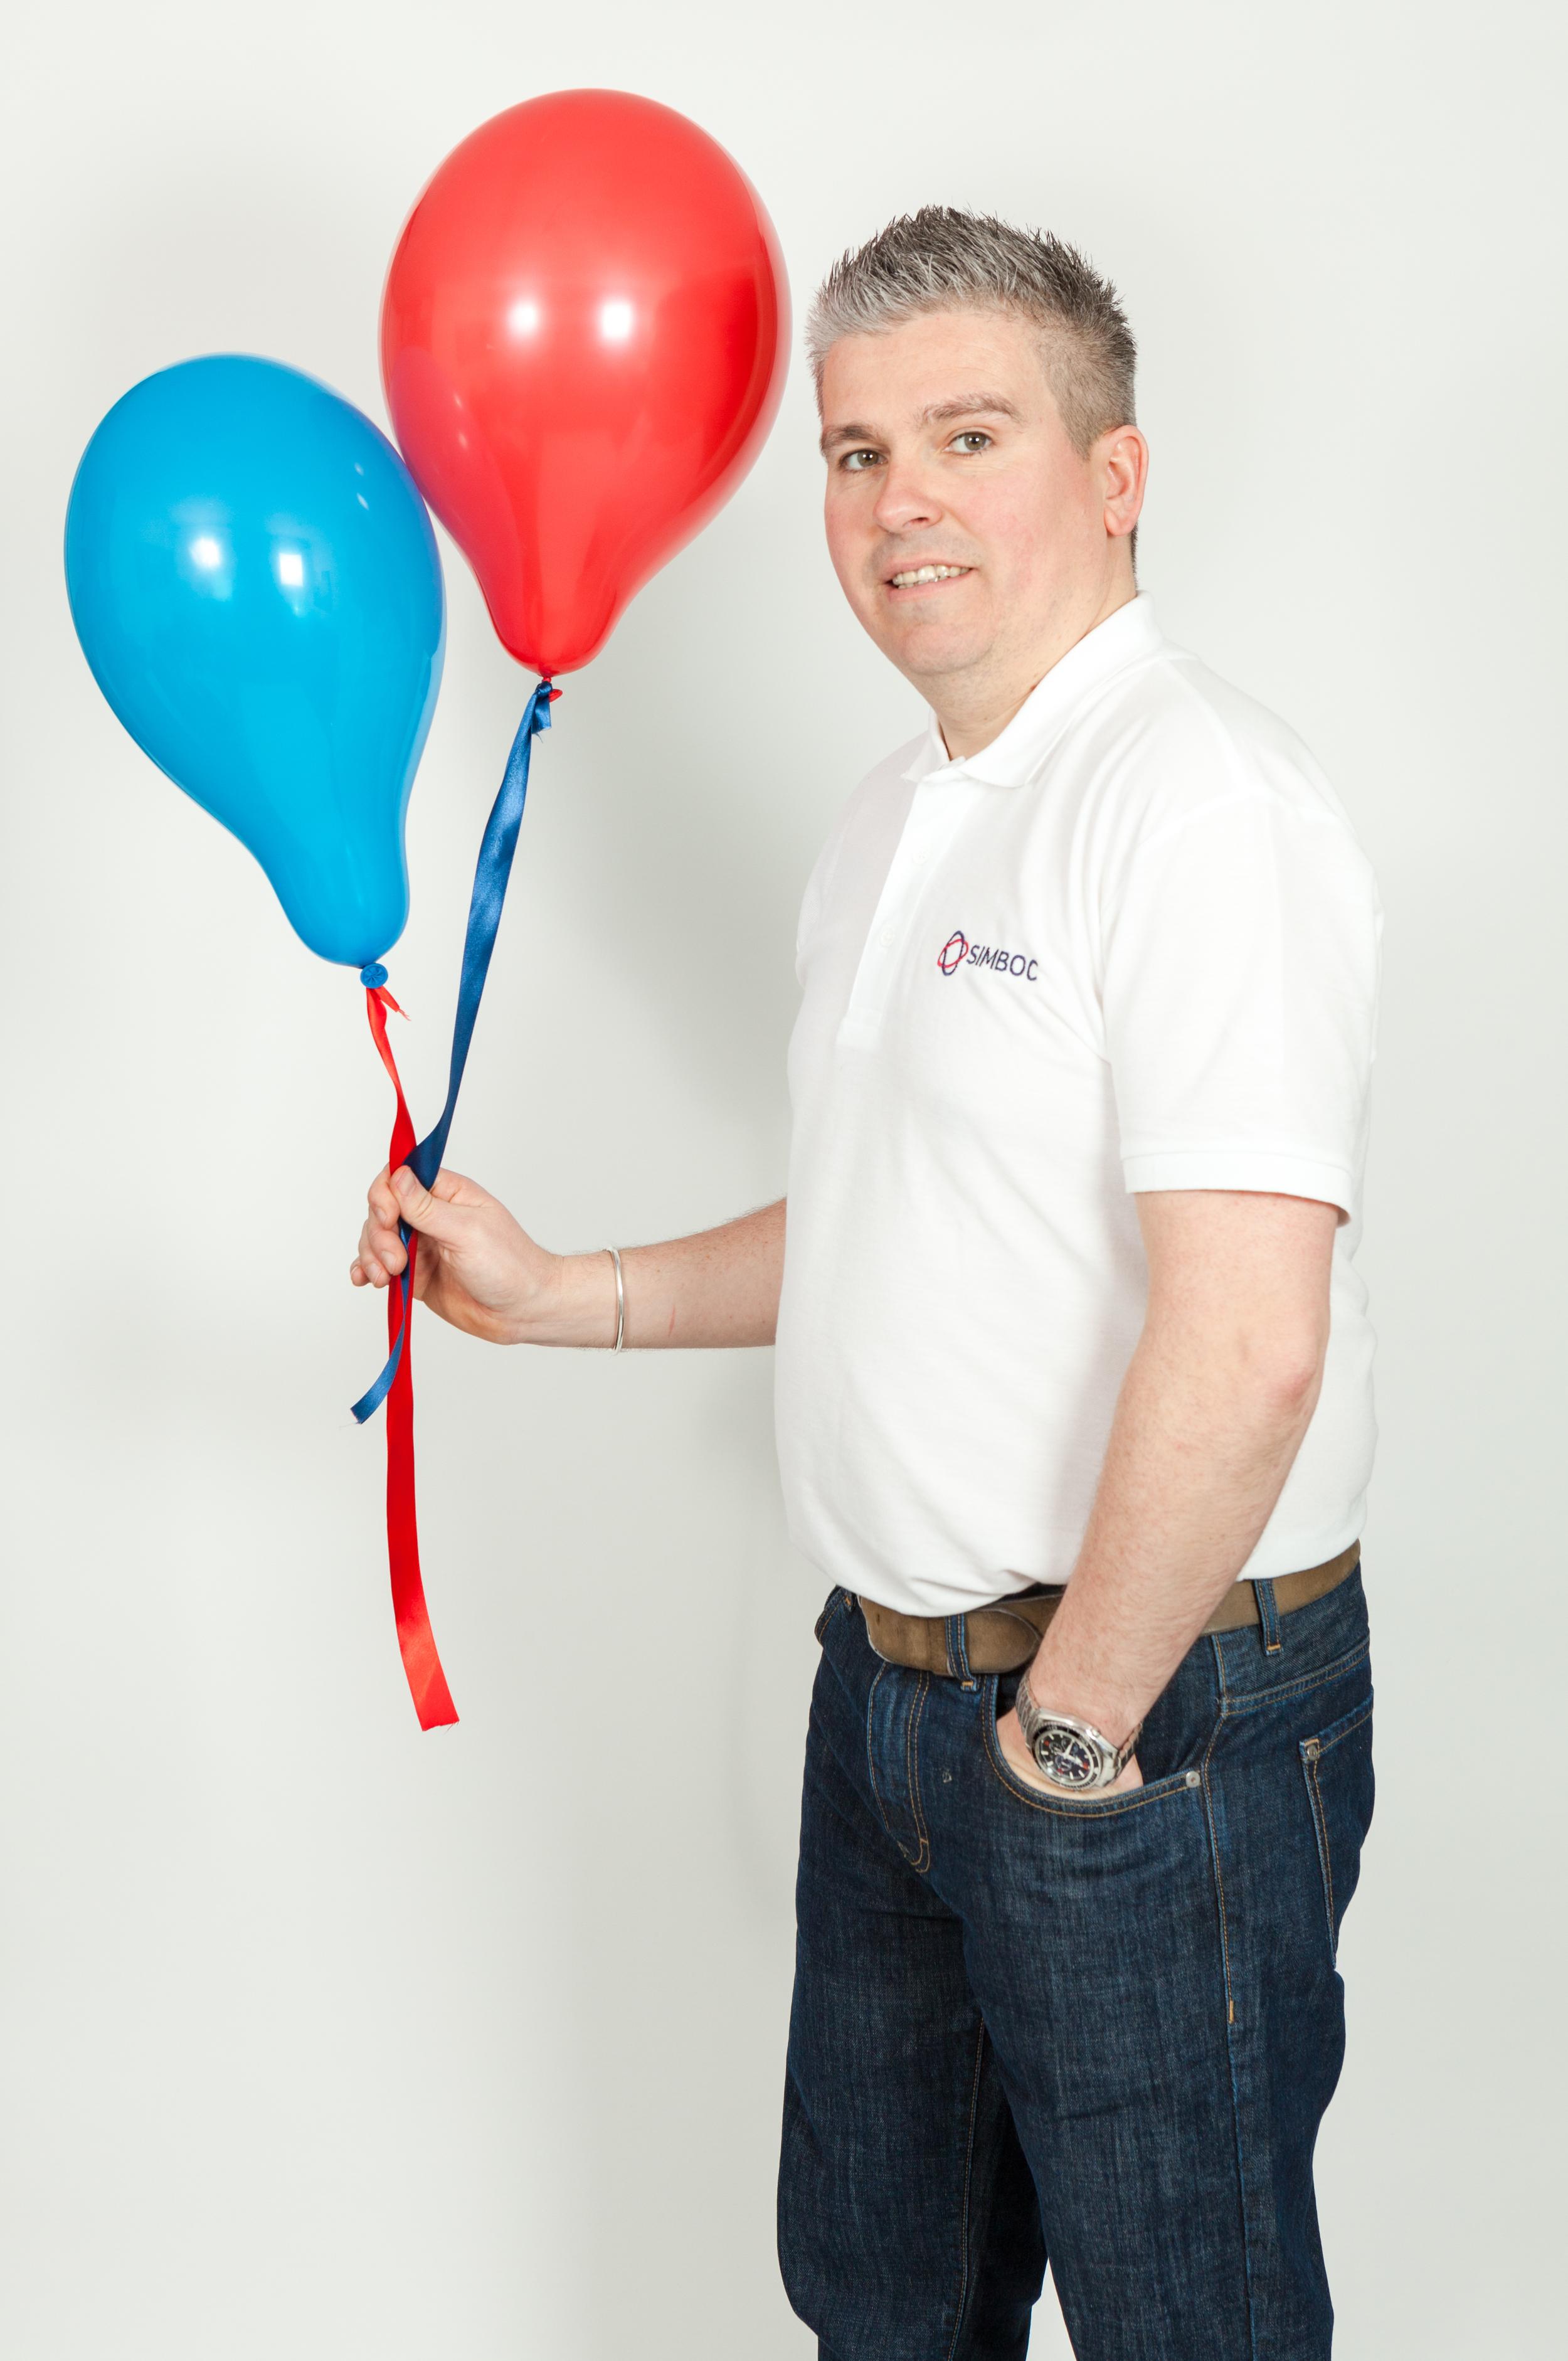 Dave Polo Shirt - 2 Ballons_SimbocLtd_6425.jpg